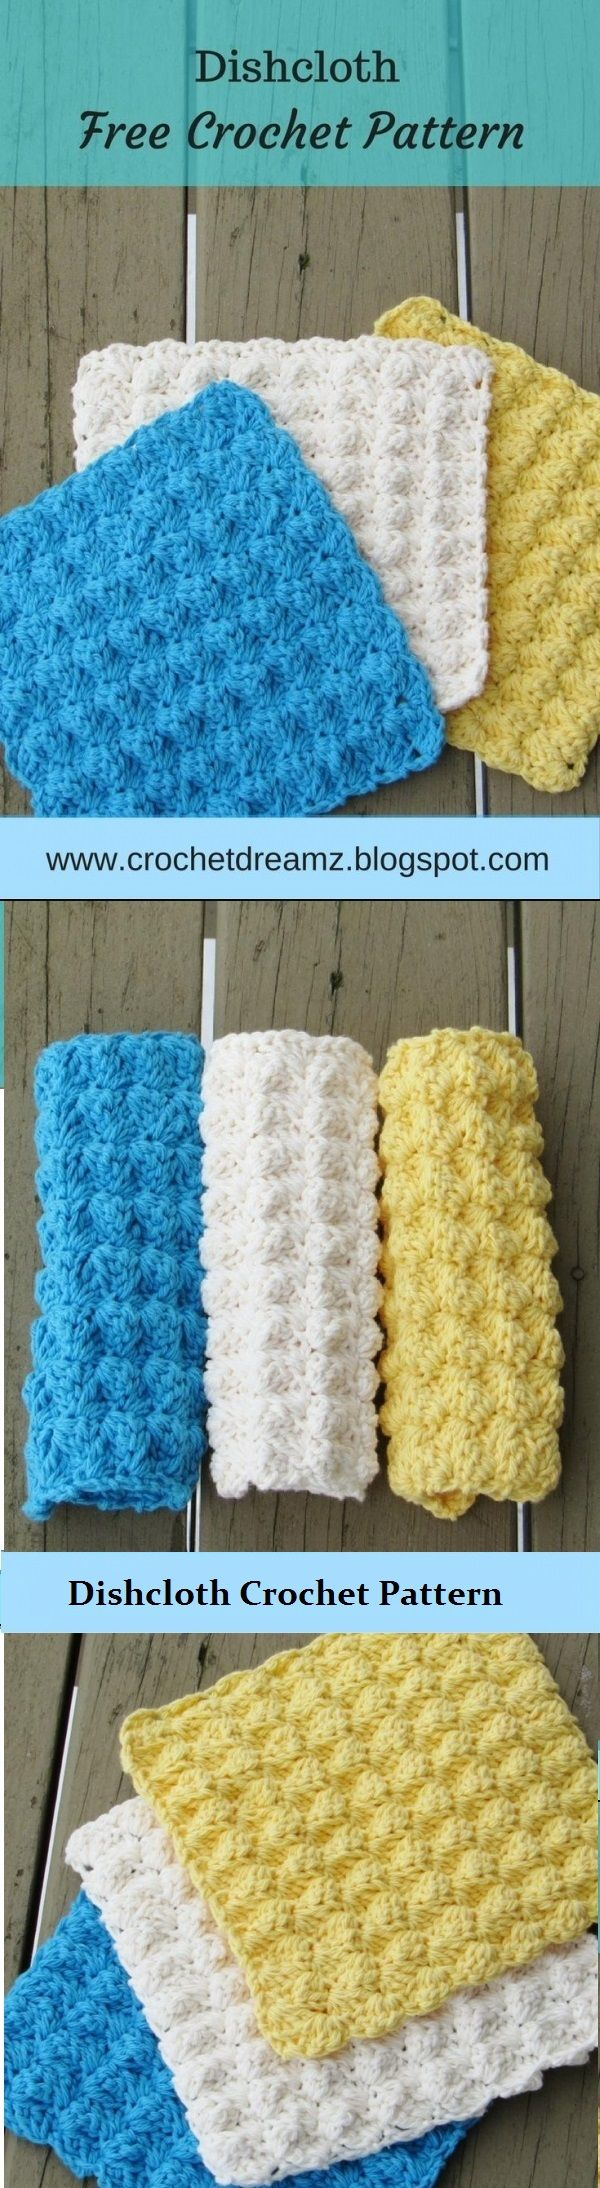 Dishcloth or Washcloth Crochet Pattern, Free Crochet Pattern | Free ...